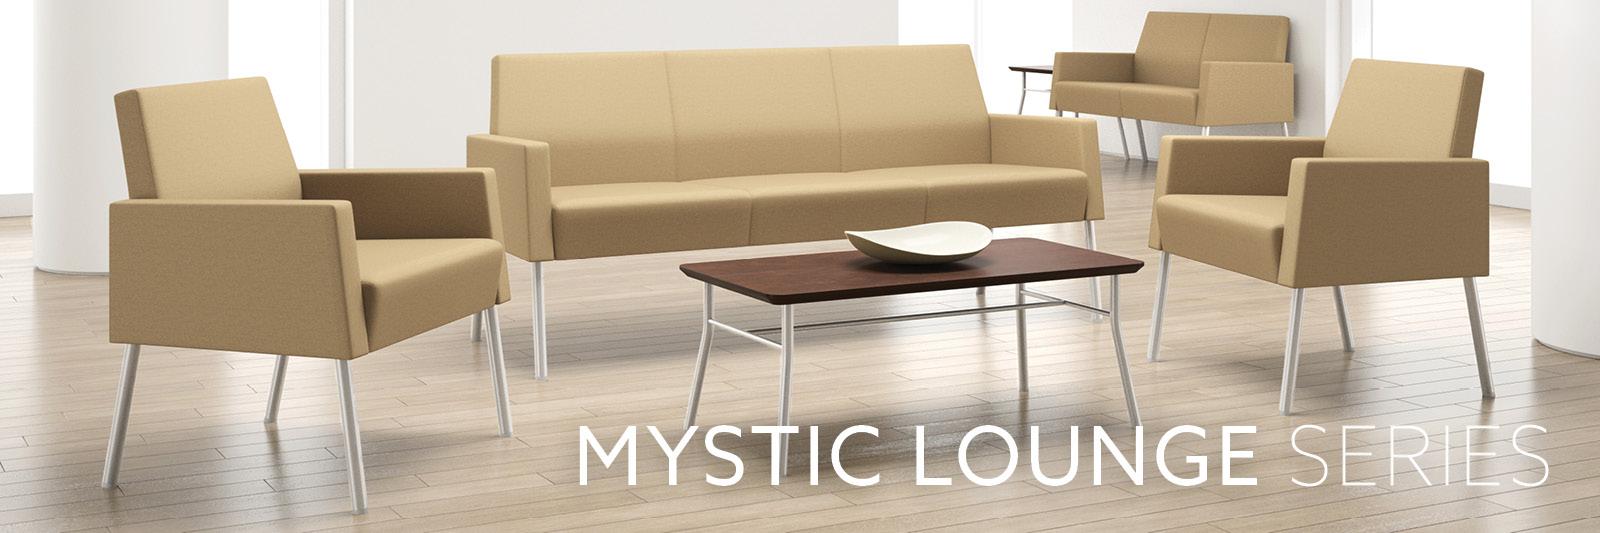 mystic lounge